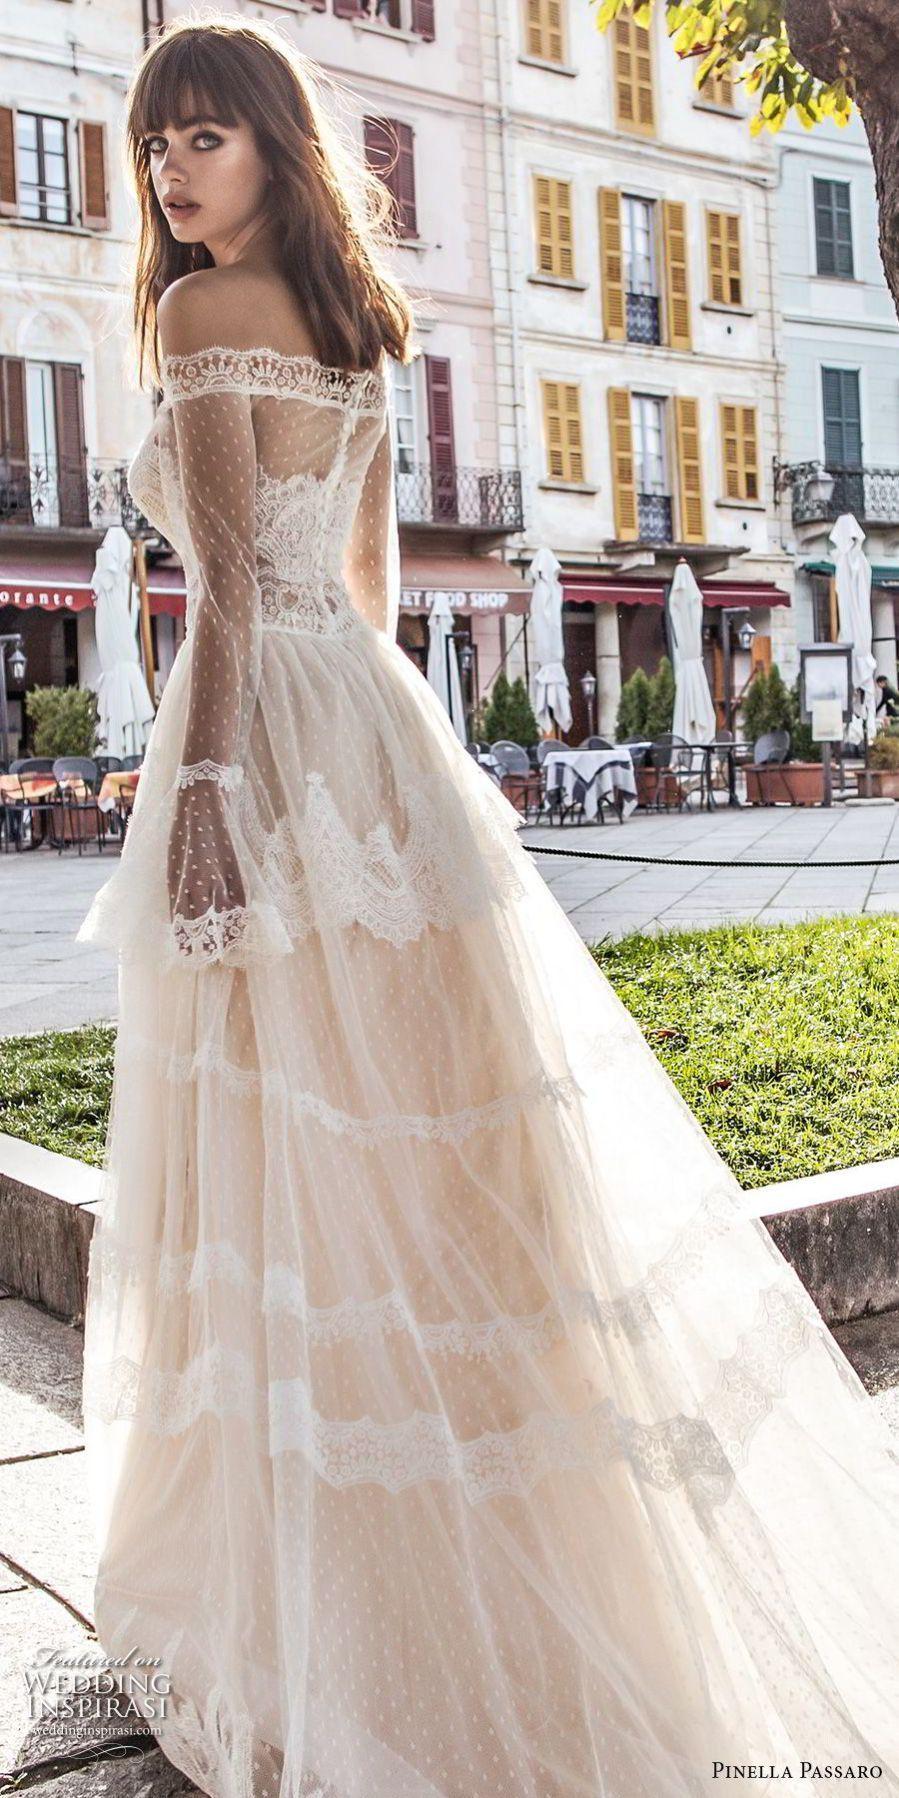 Pinella passaro wedding dresses weđing dress pinterest